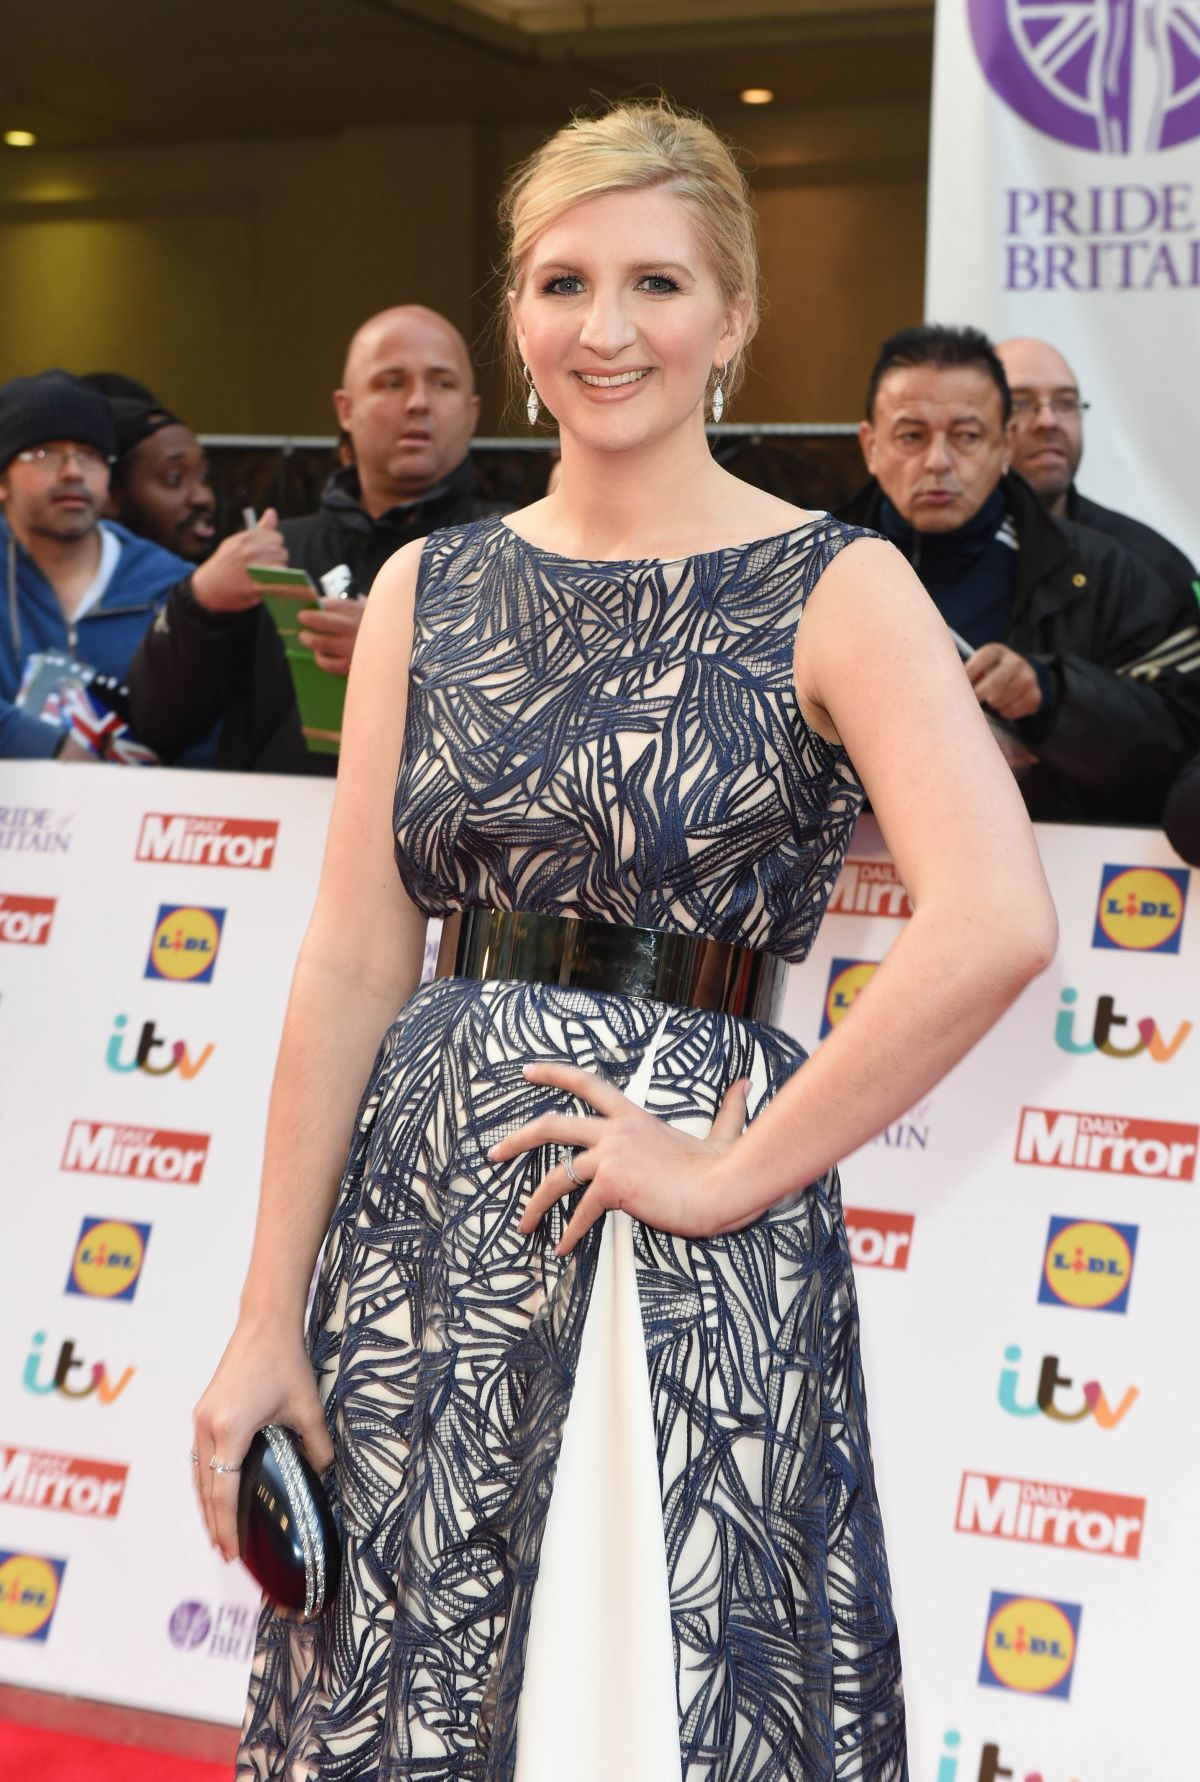 REBECCA ADLINGTON at Pride of Britain Awards 2015 in London 09/28/2015